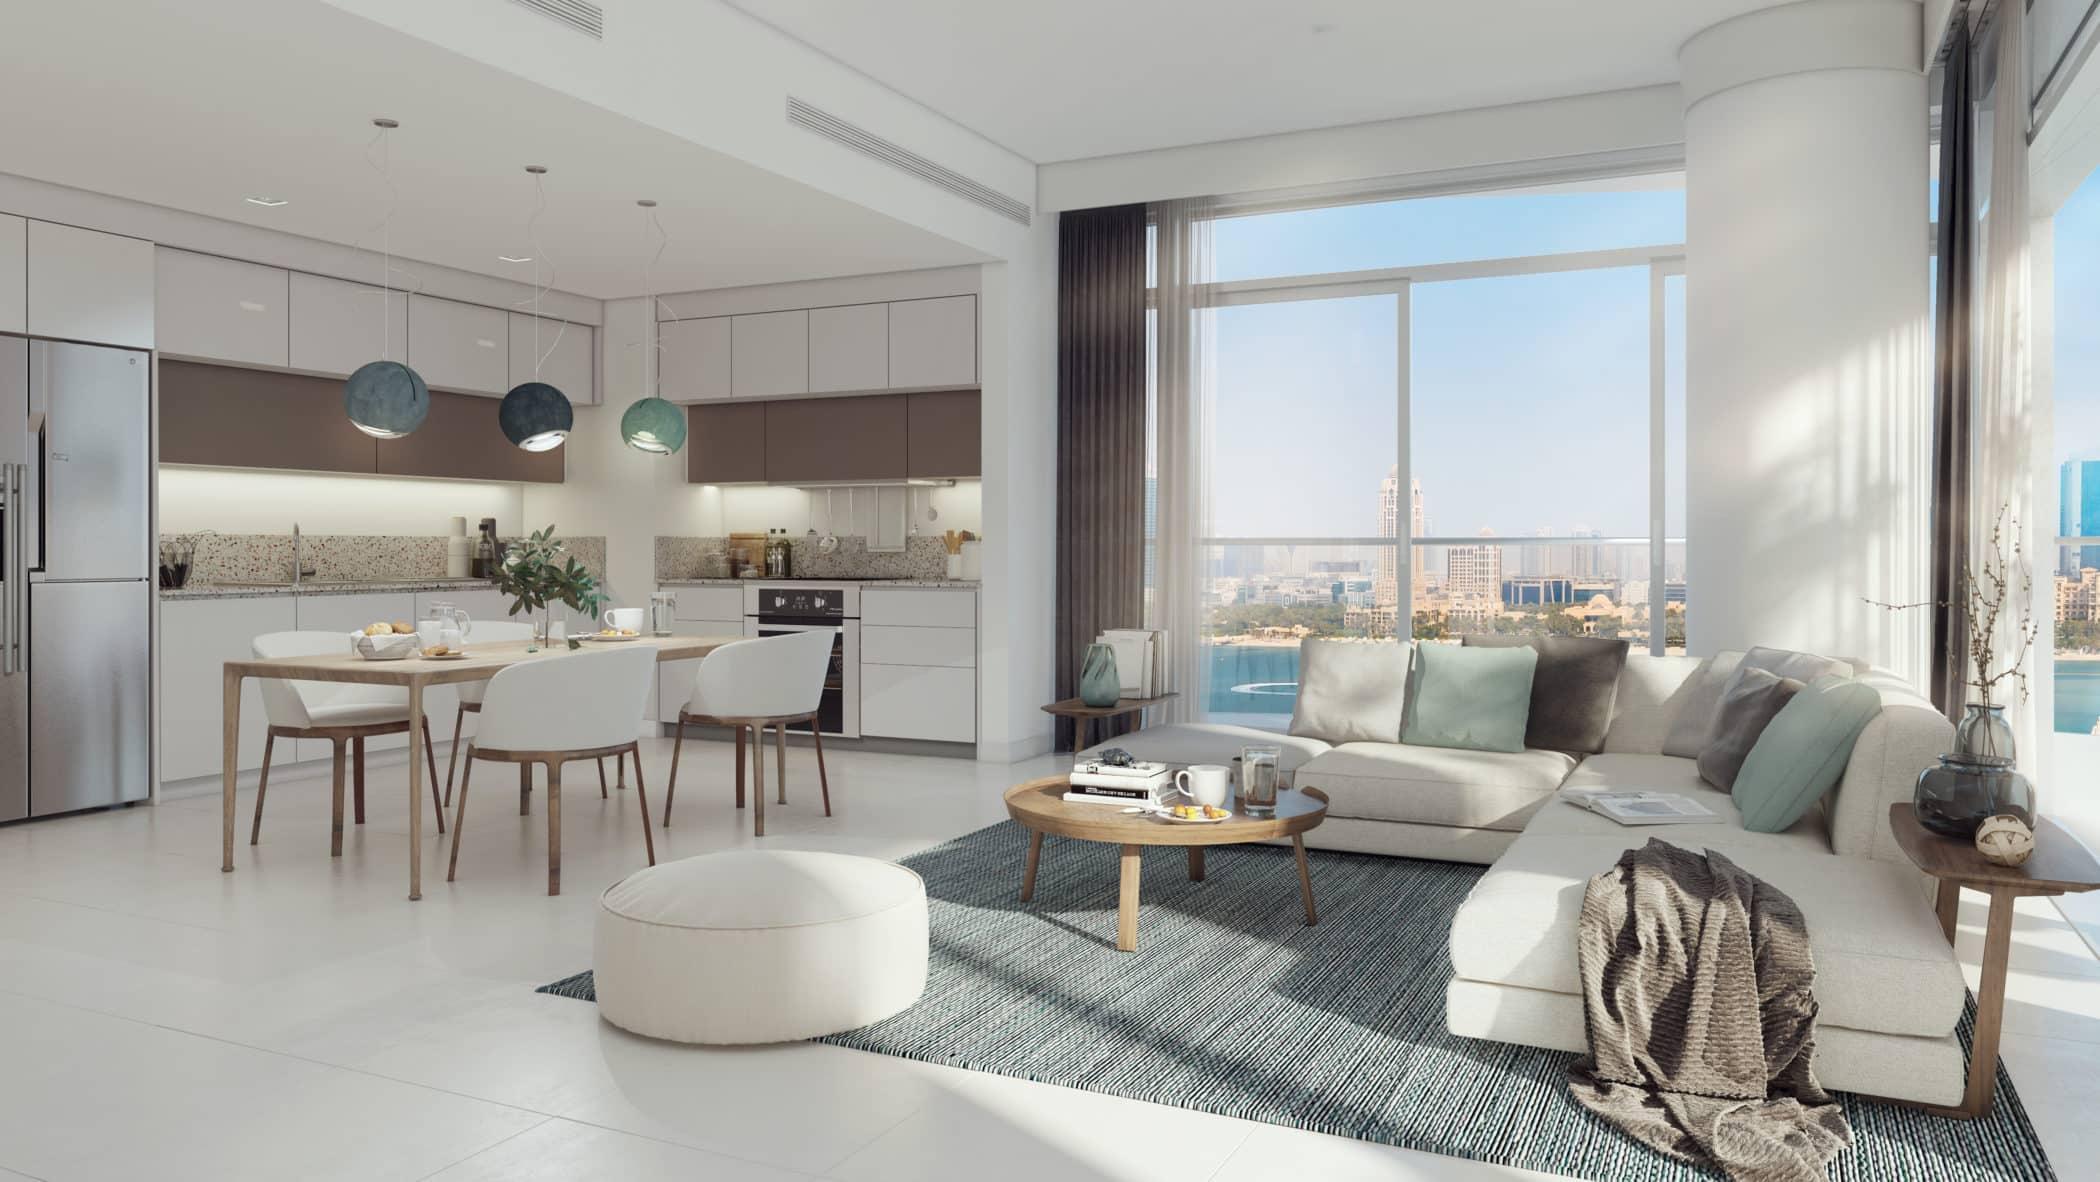 Marina Vista Villas by EMAAR in Emaar Beachfront, Dubai. Premium 3 and 4 bedroom villas for Sale in Dubai 3 2